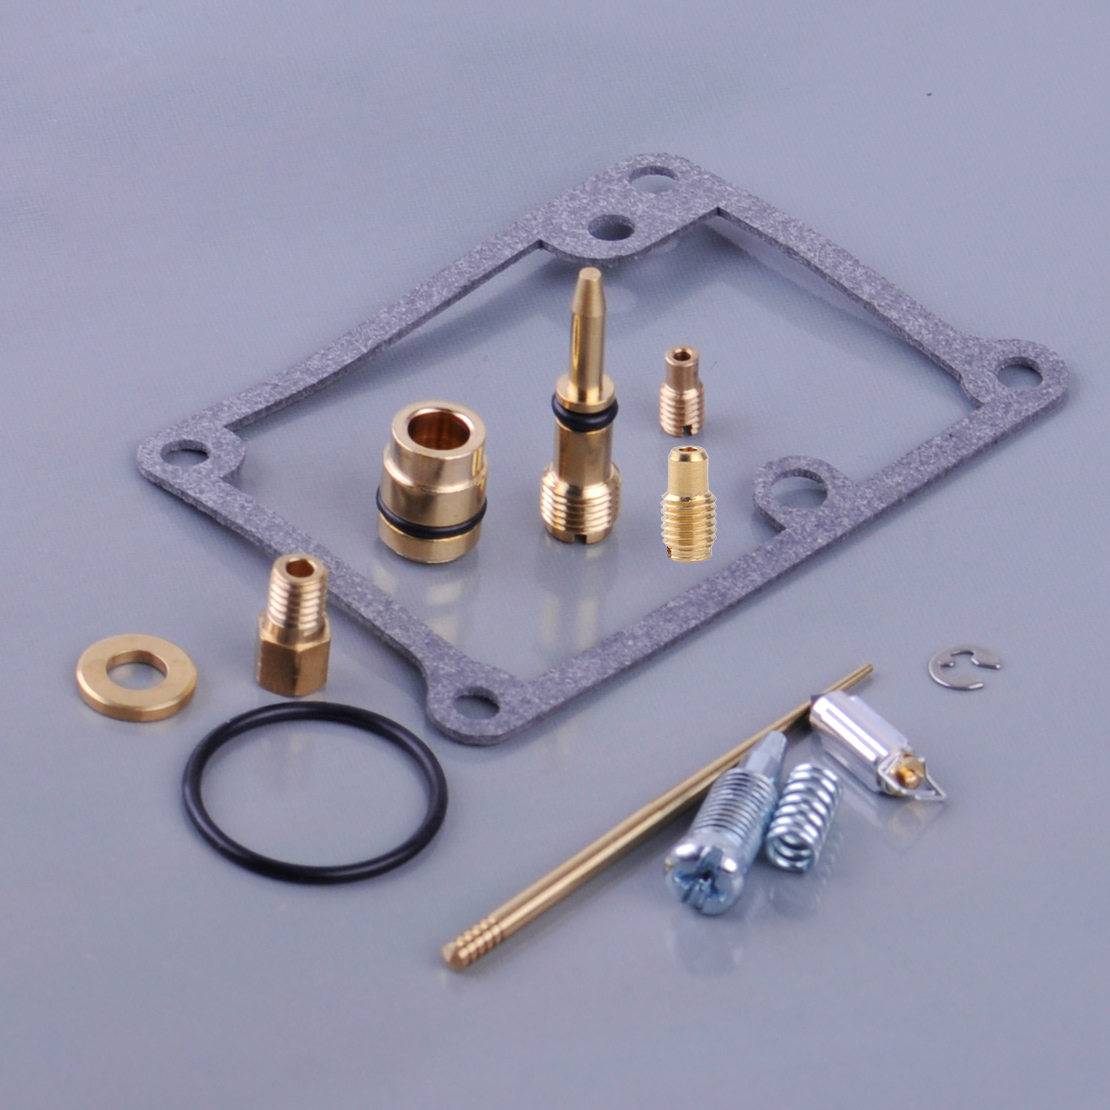 small resolution of fuel system rebuild kits for yamaha banshee yfz350 carburetor carb rebuild kit repair yfz 350 2